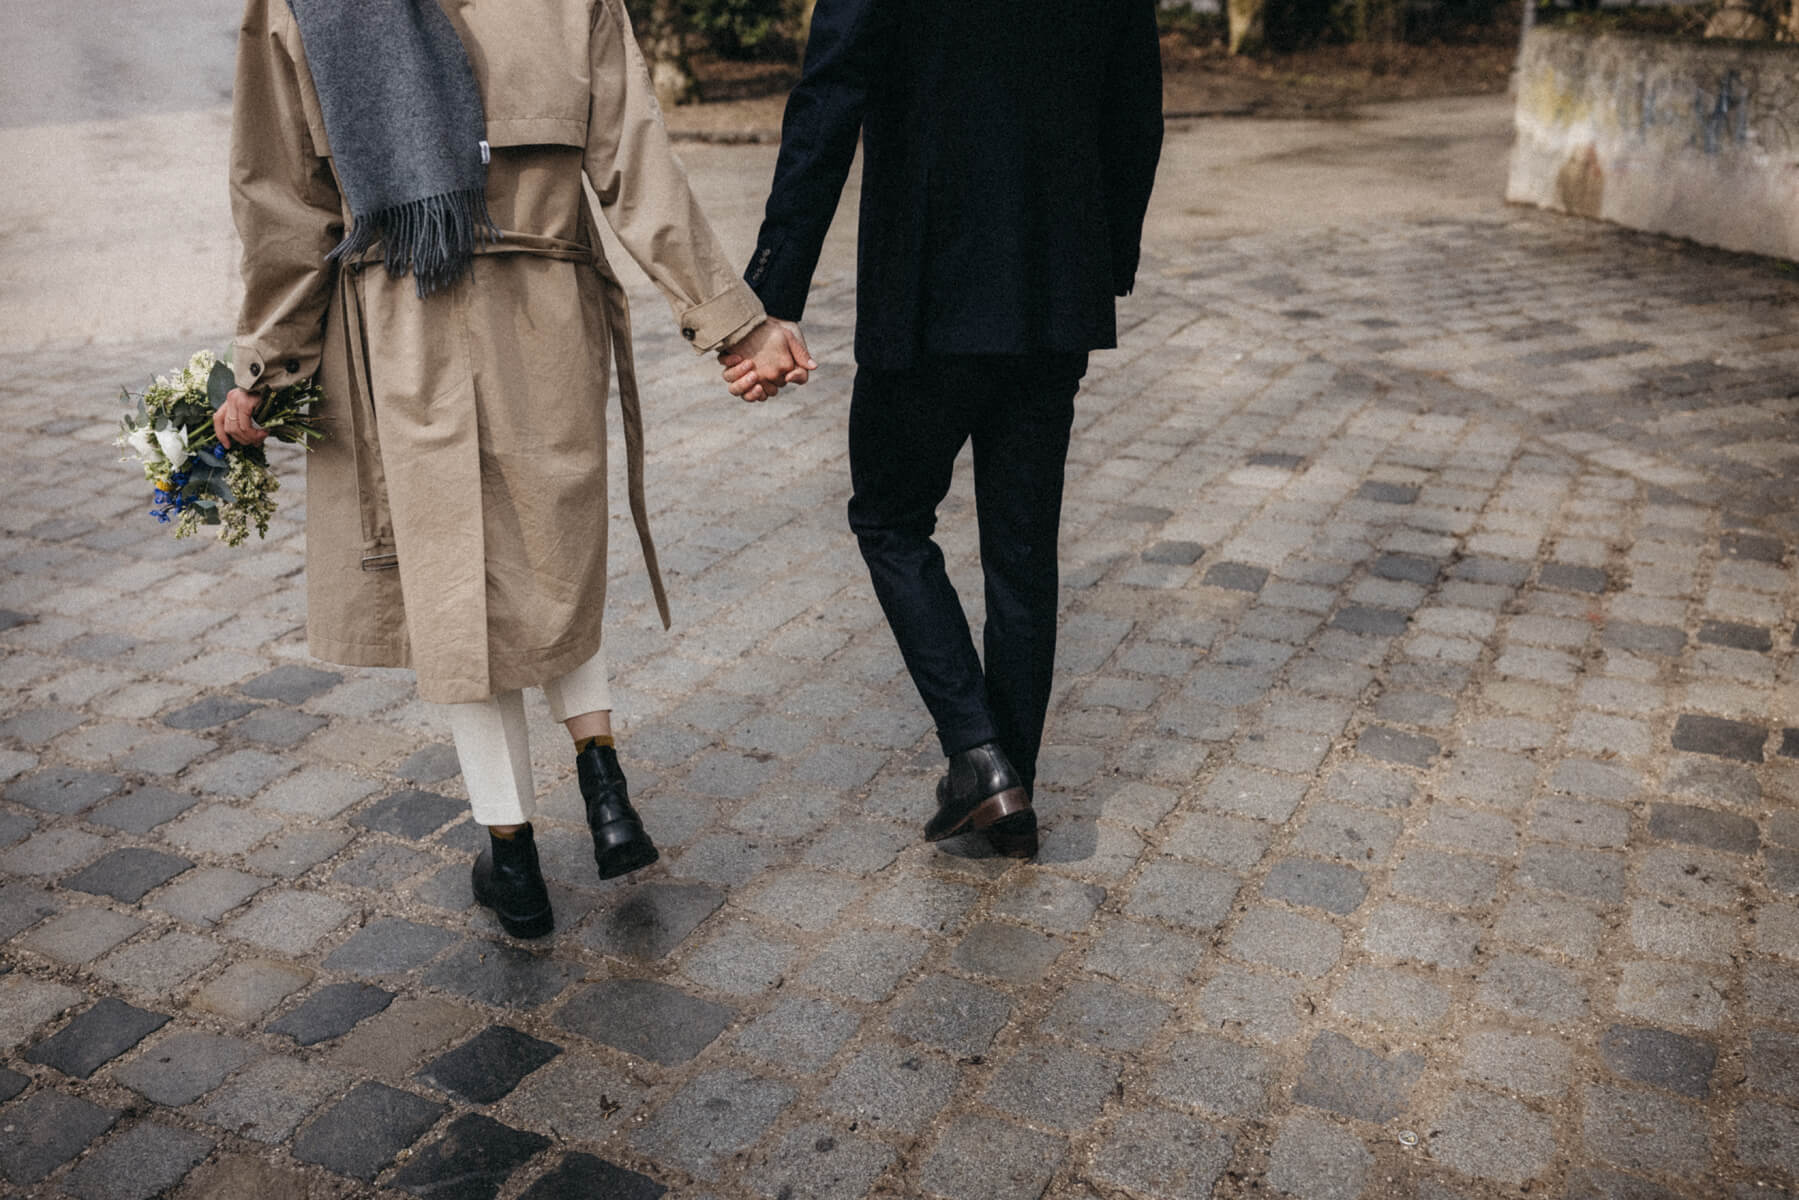 raissa simon fotografie urban civil wedding munich 045 - Nikolija + Niko